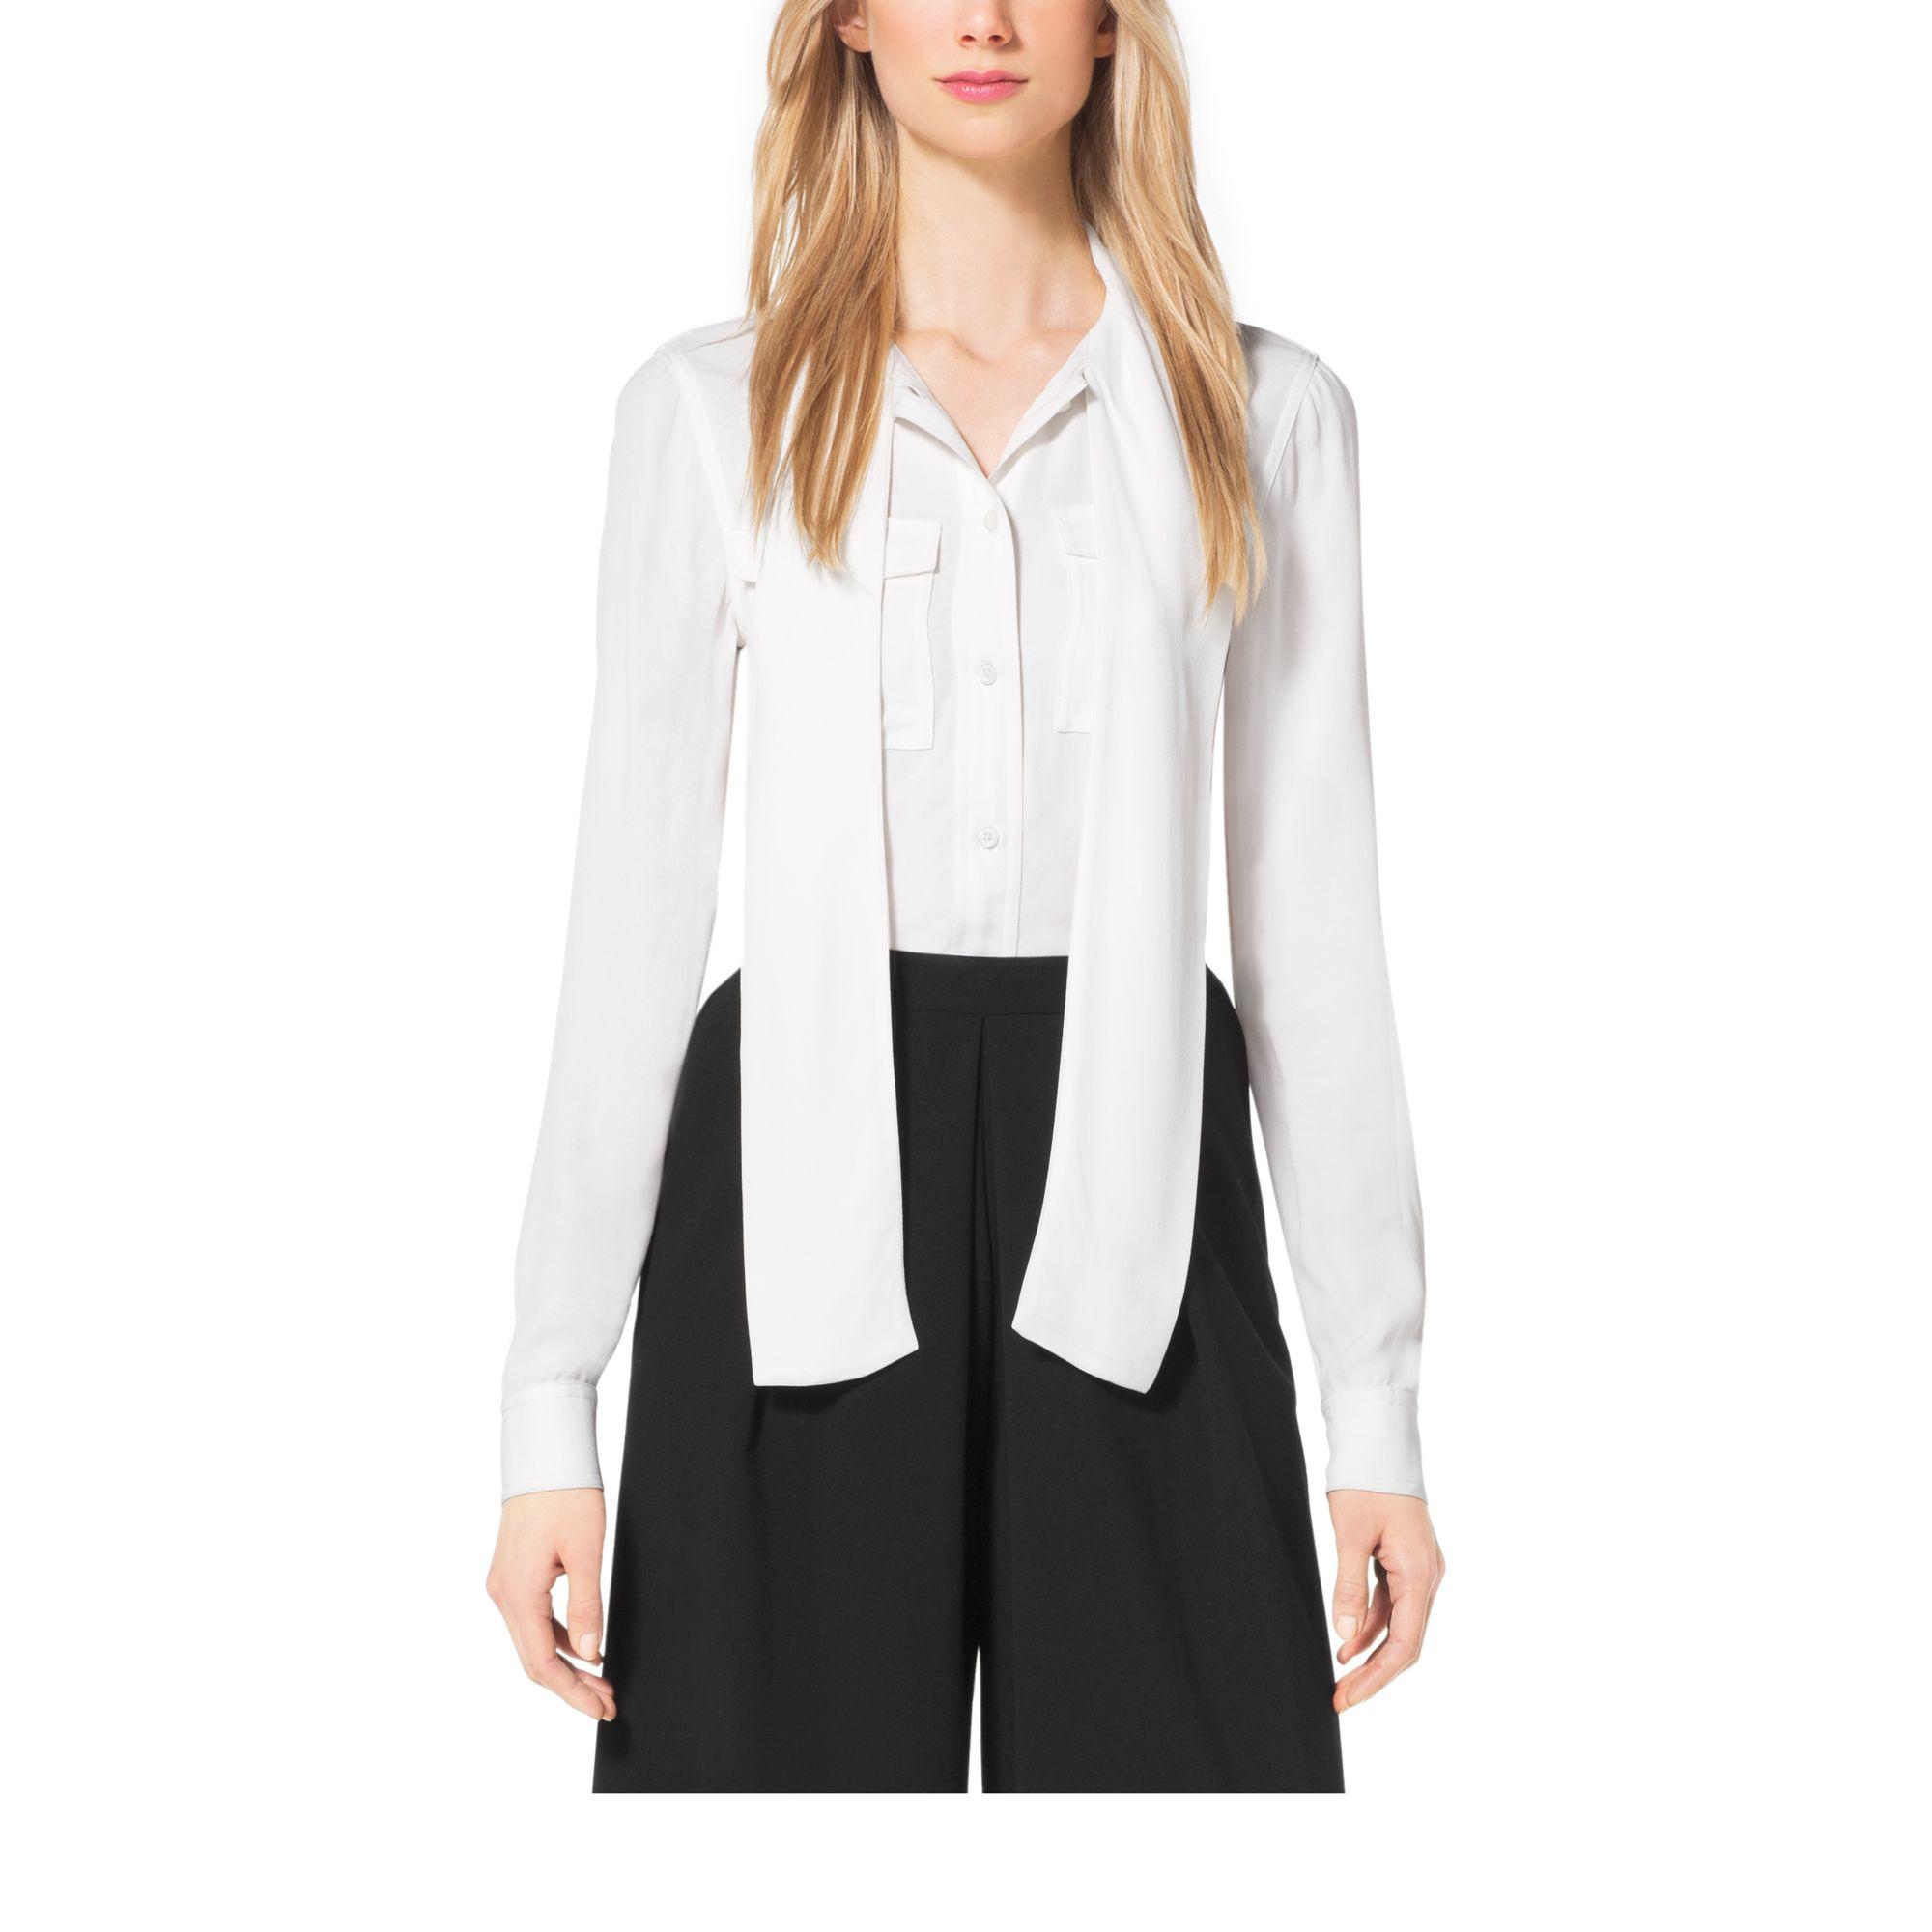 michael kors tie neck blouse in white lyst. Black Bedroom Furniture Sets. Home Design Ideas